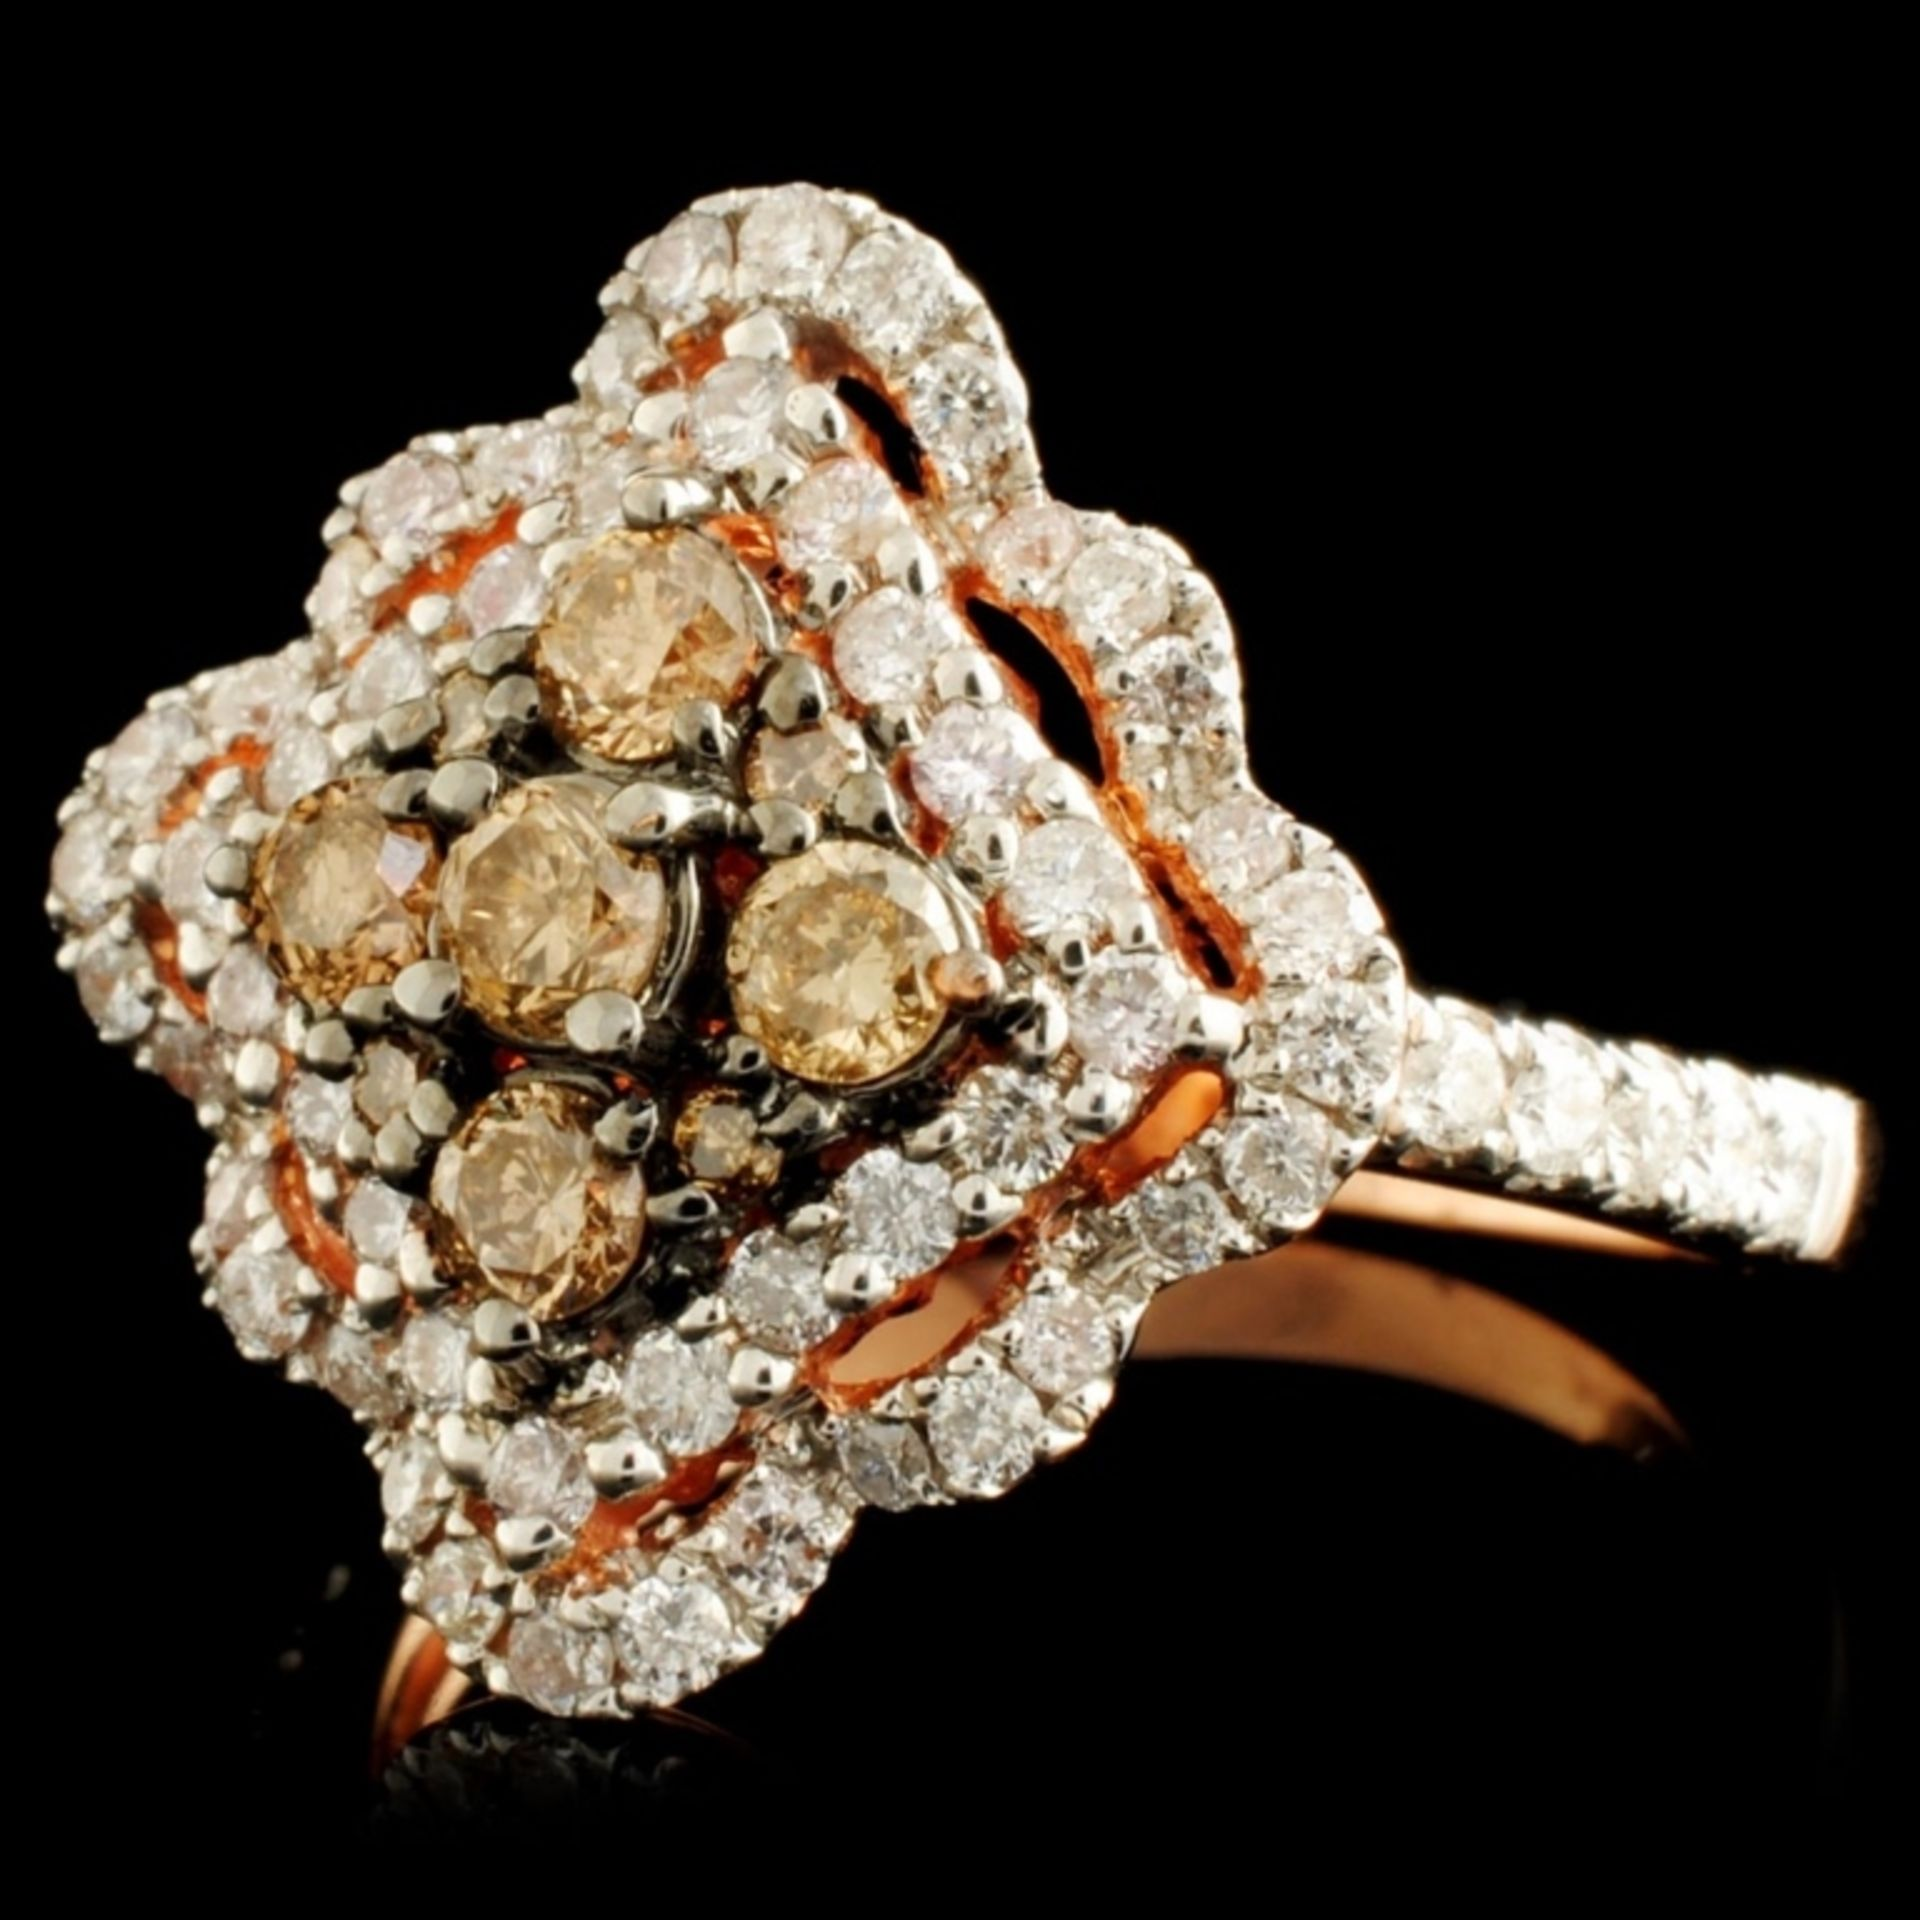 14K Gold 1.19ctw Diamond Ring - Image 2 of 5